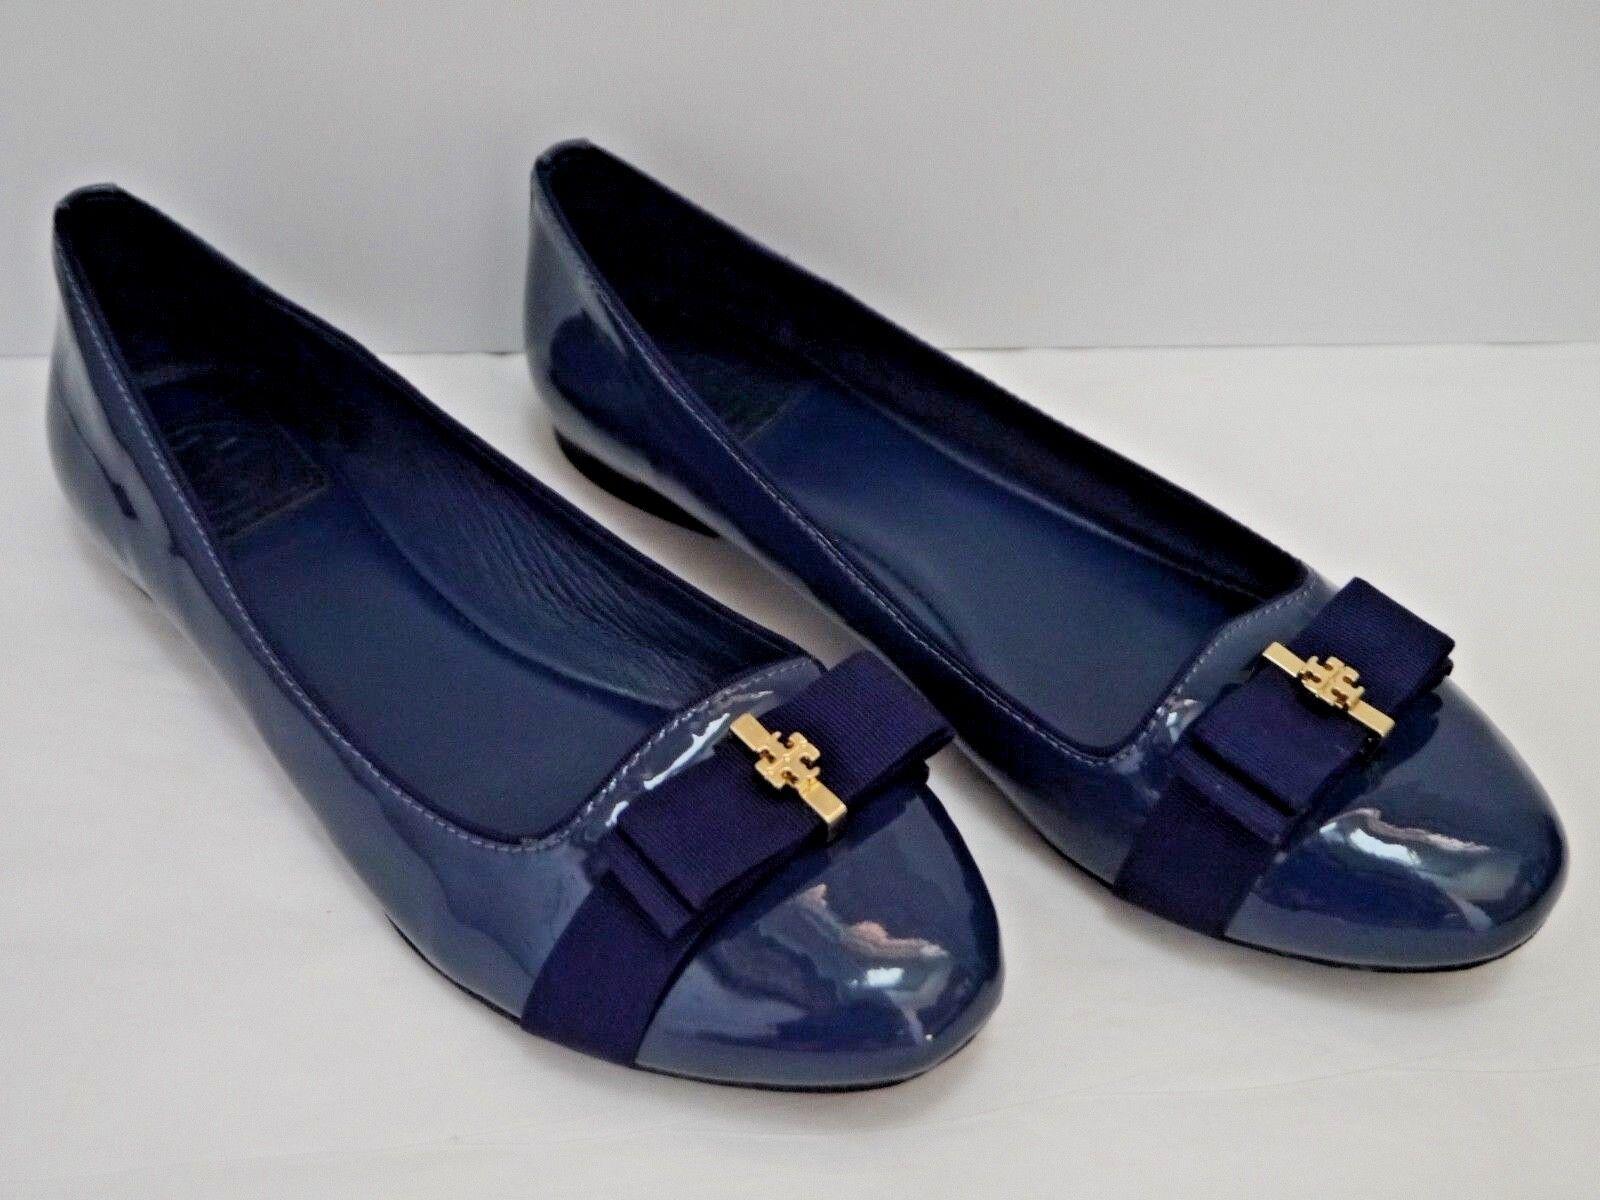 TORY BURCH $250 Trudy navy blue patent grosgrain bow ballet smoking flats 7.5